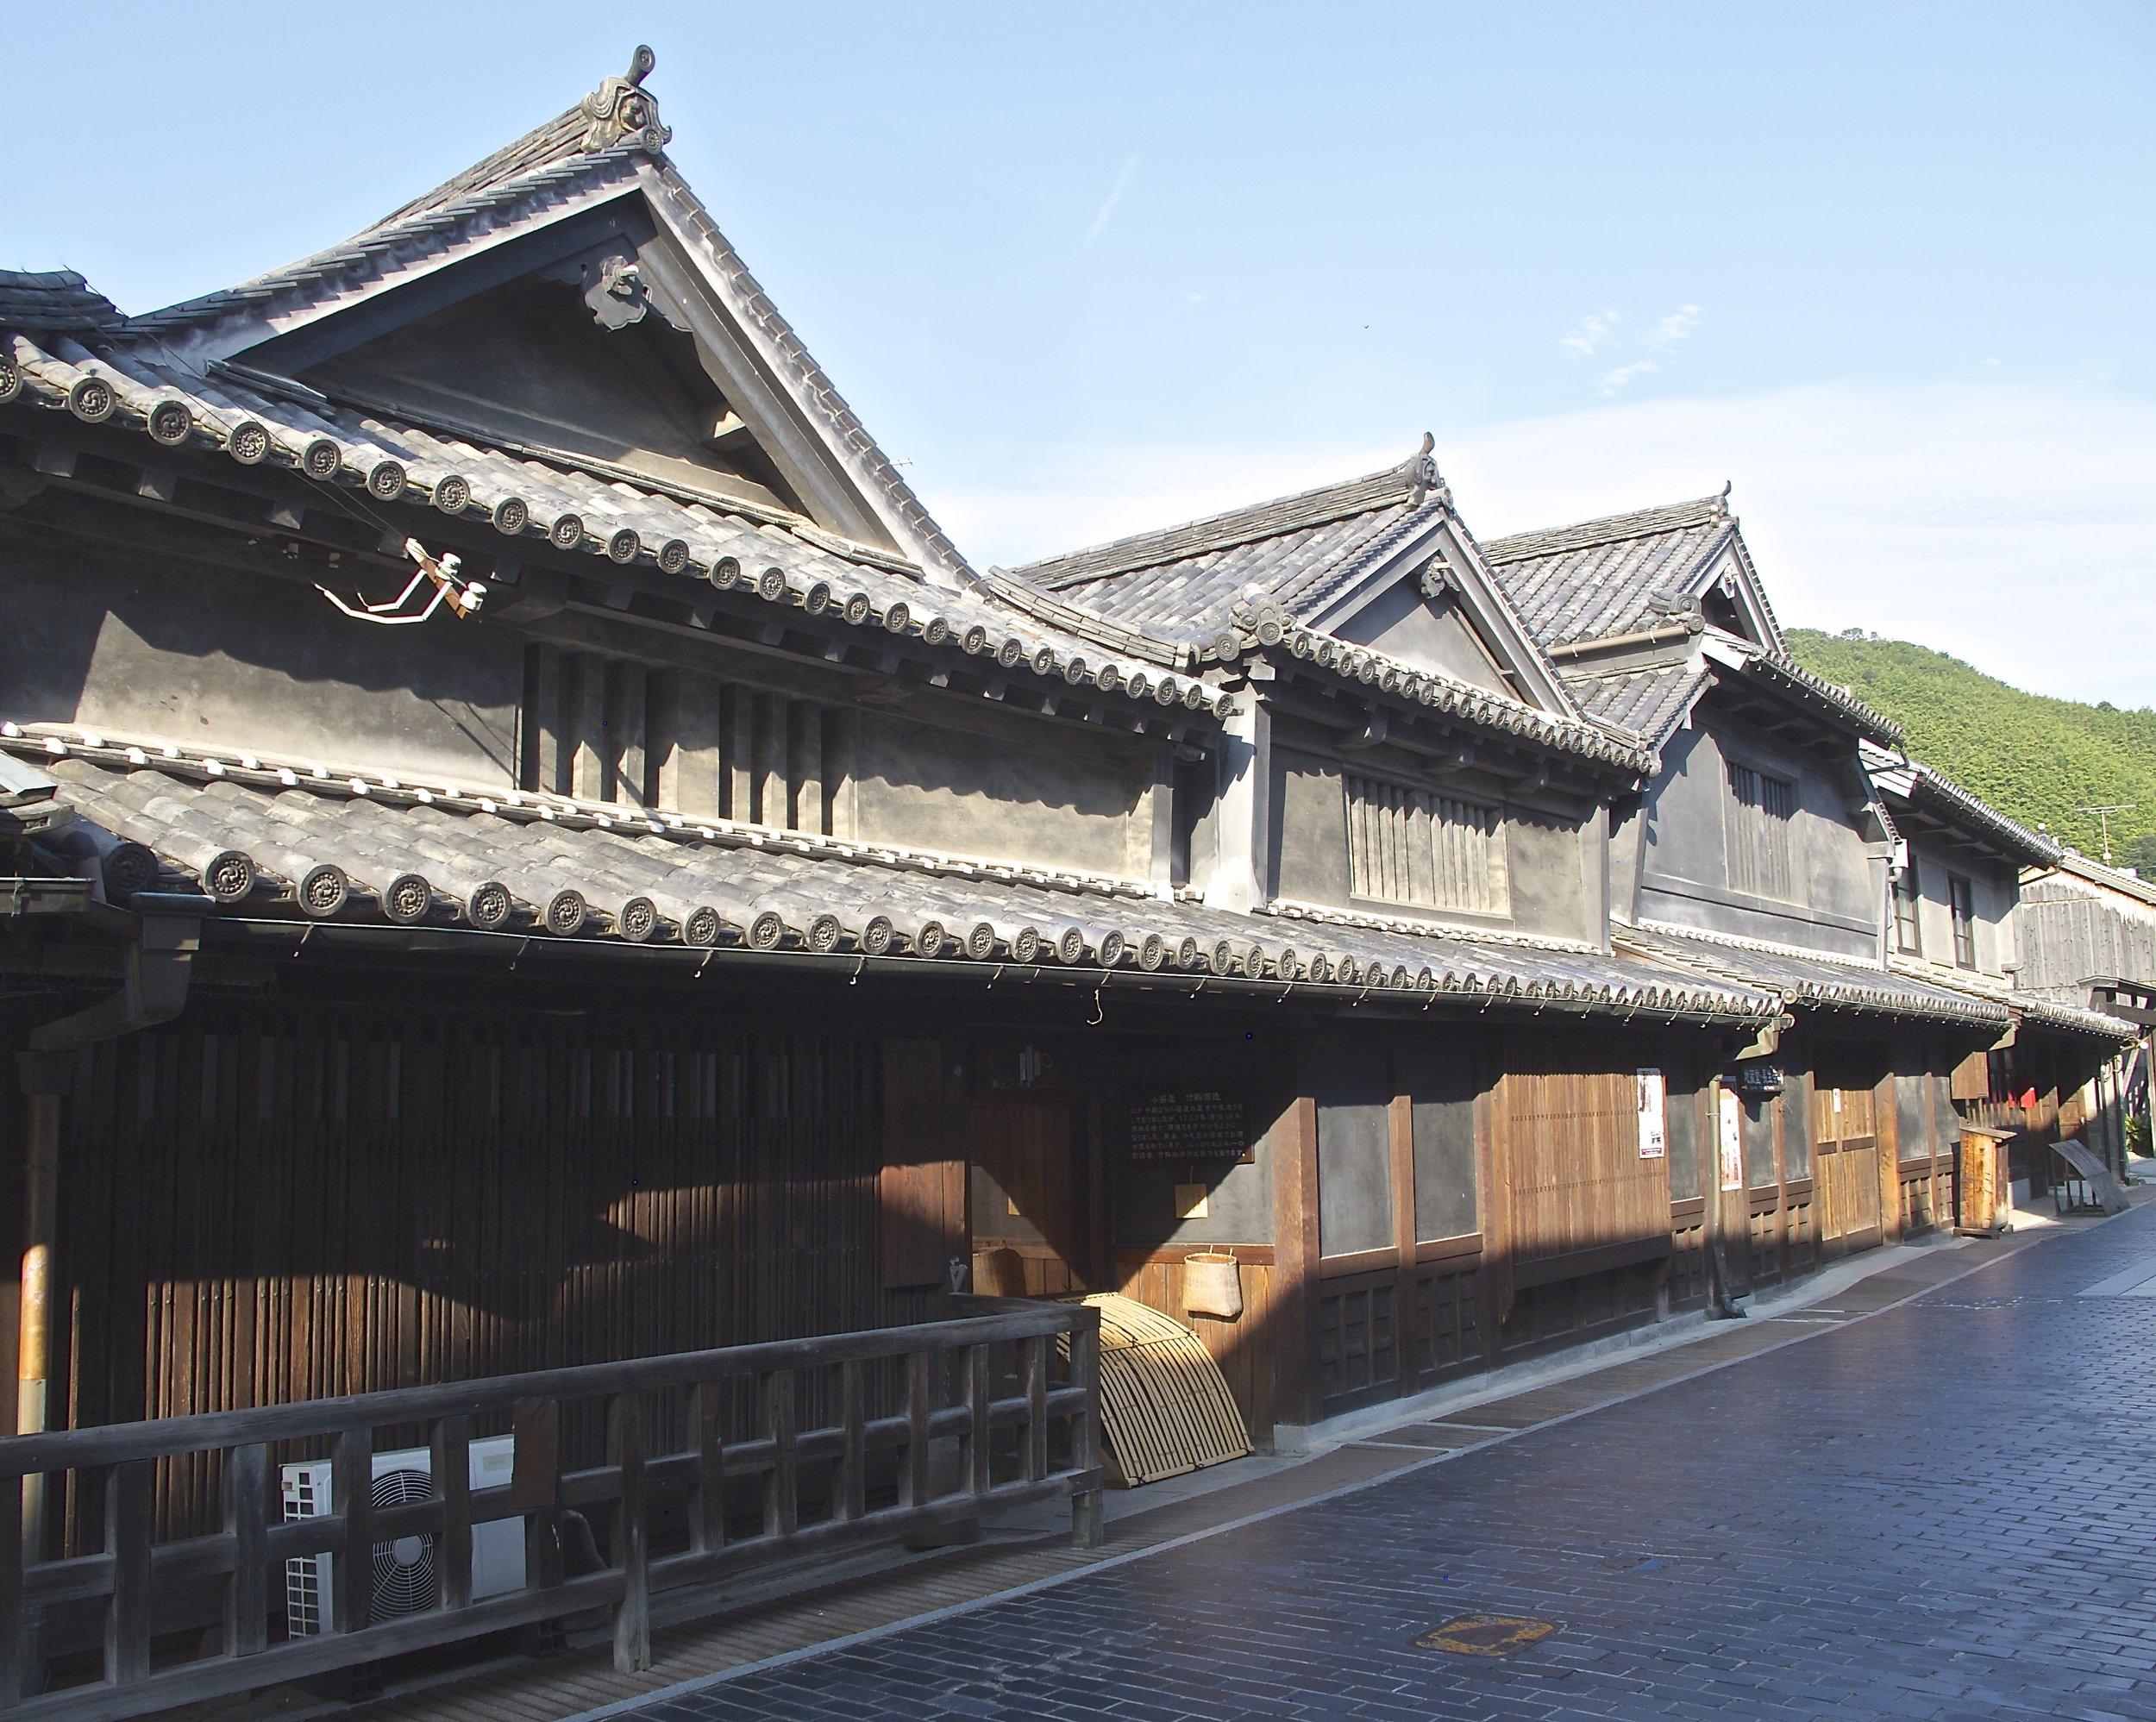 The ancient early Edo era buildings of Taketsuru Shuzo.